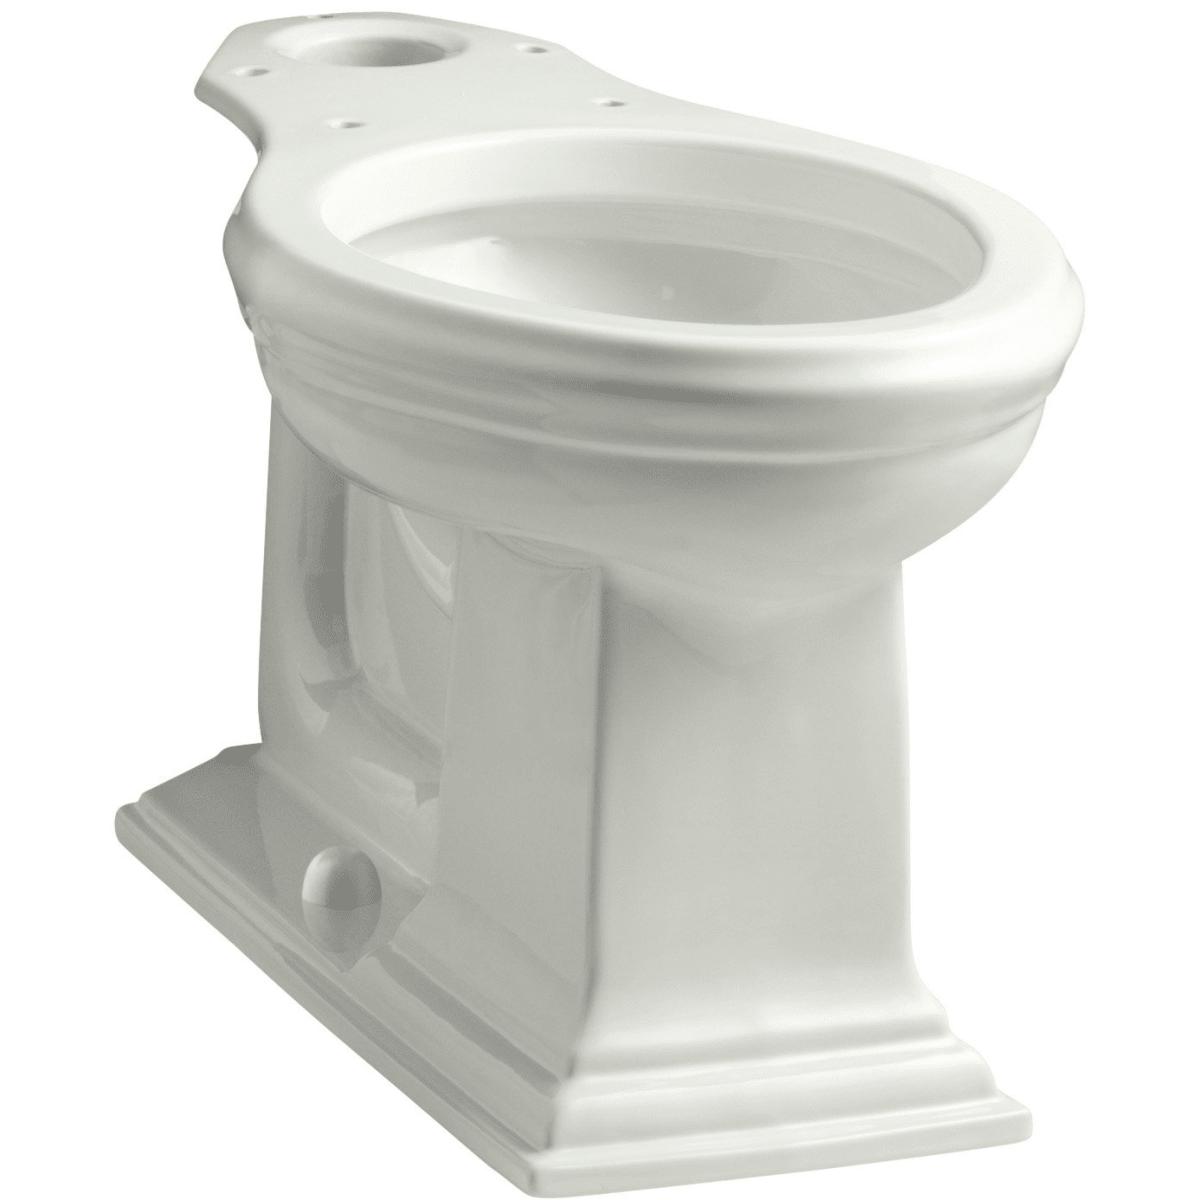 Awe Inspiring Kohler K 4380 0 White Elongated Bowl Only From The Memoirs Andrewgaddart Wooden Chair Designs For Living Room Andrewgaddartcom